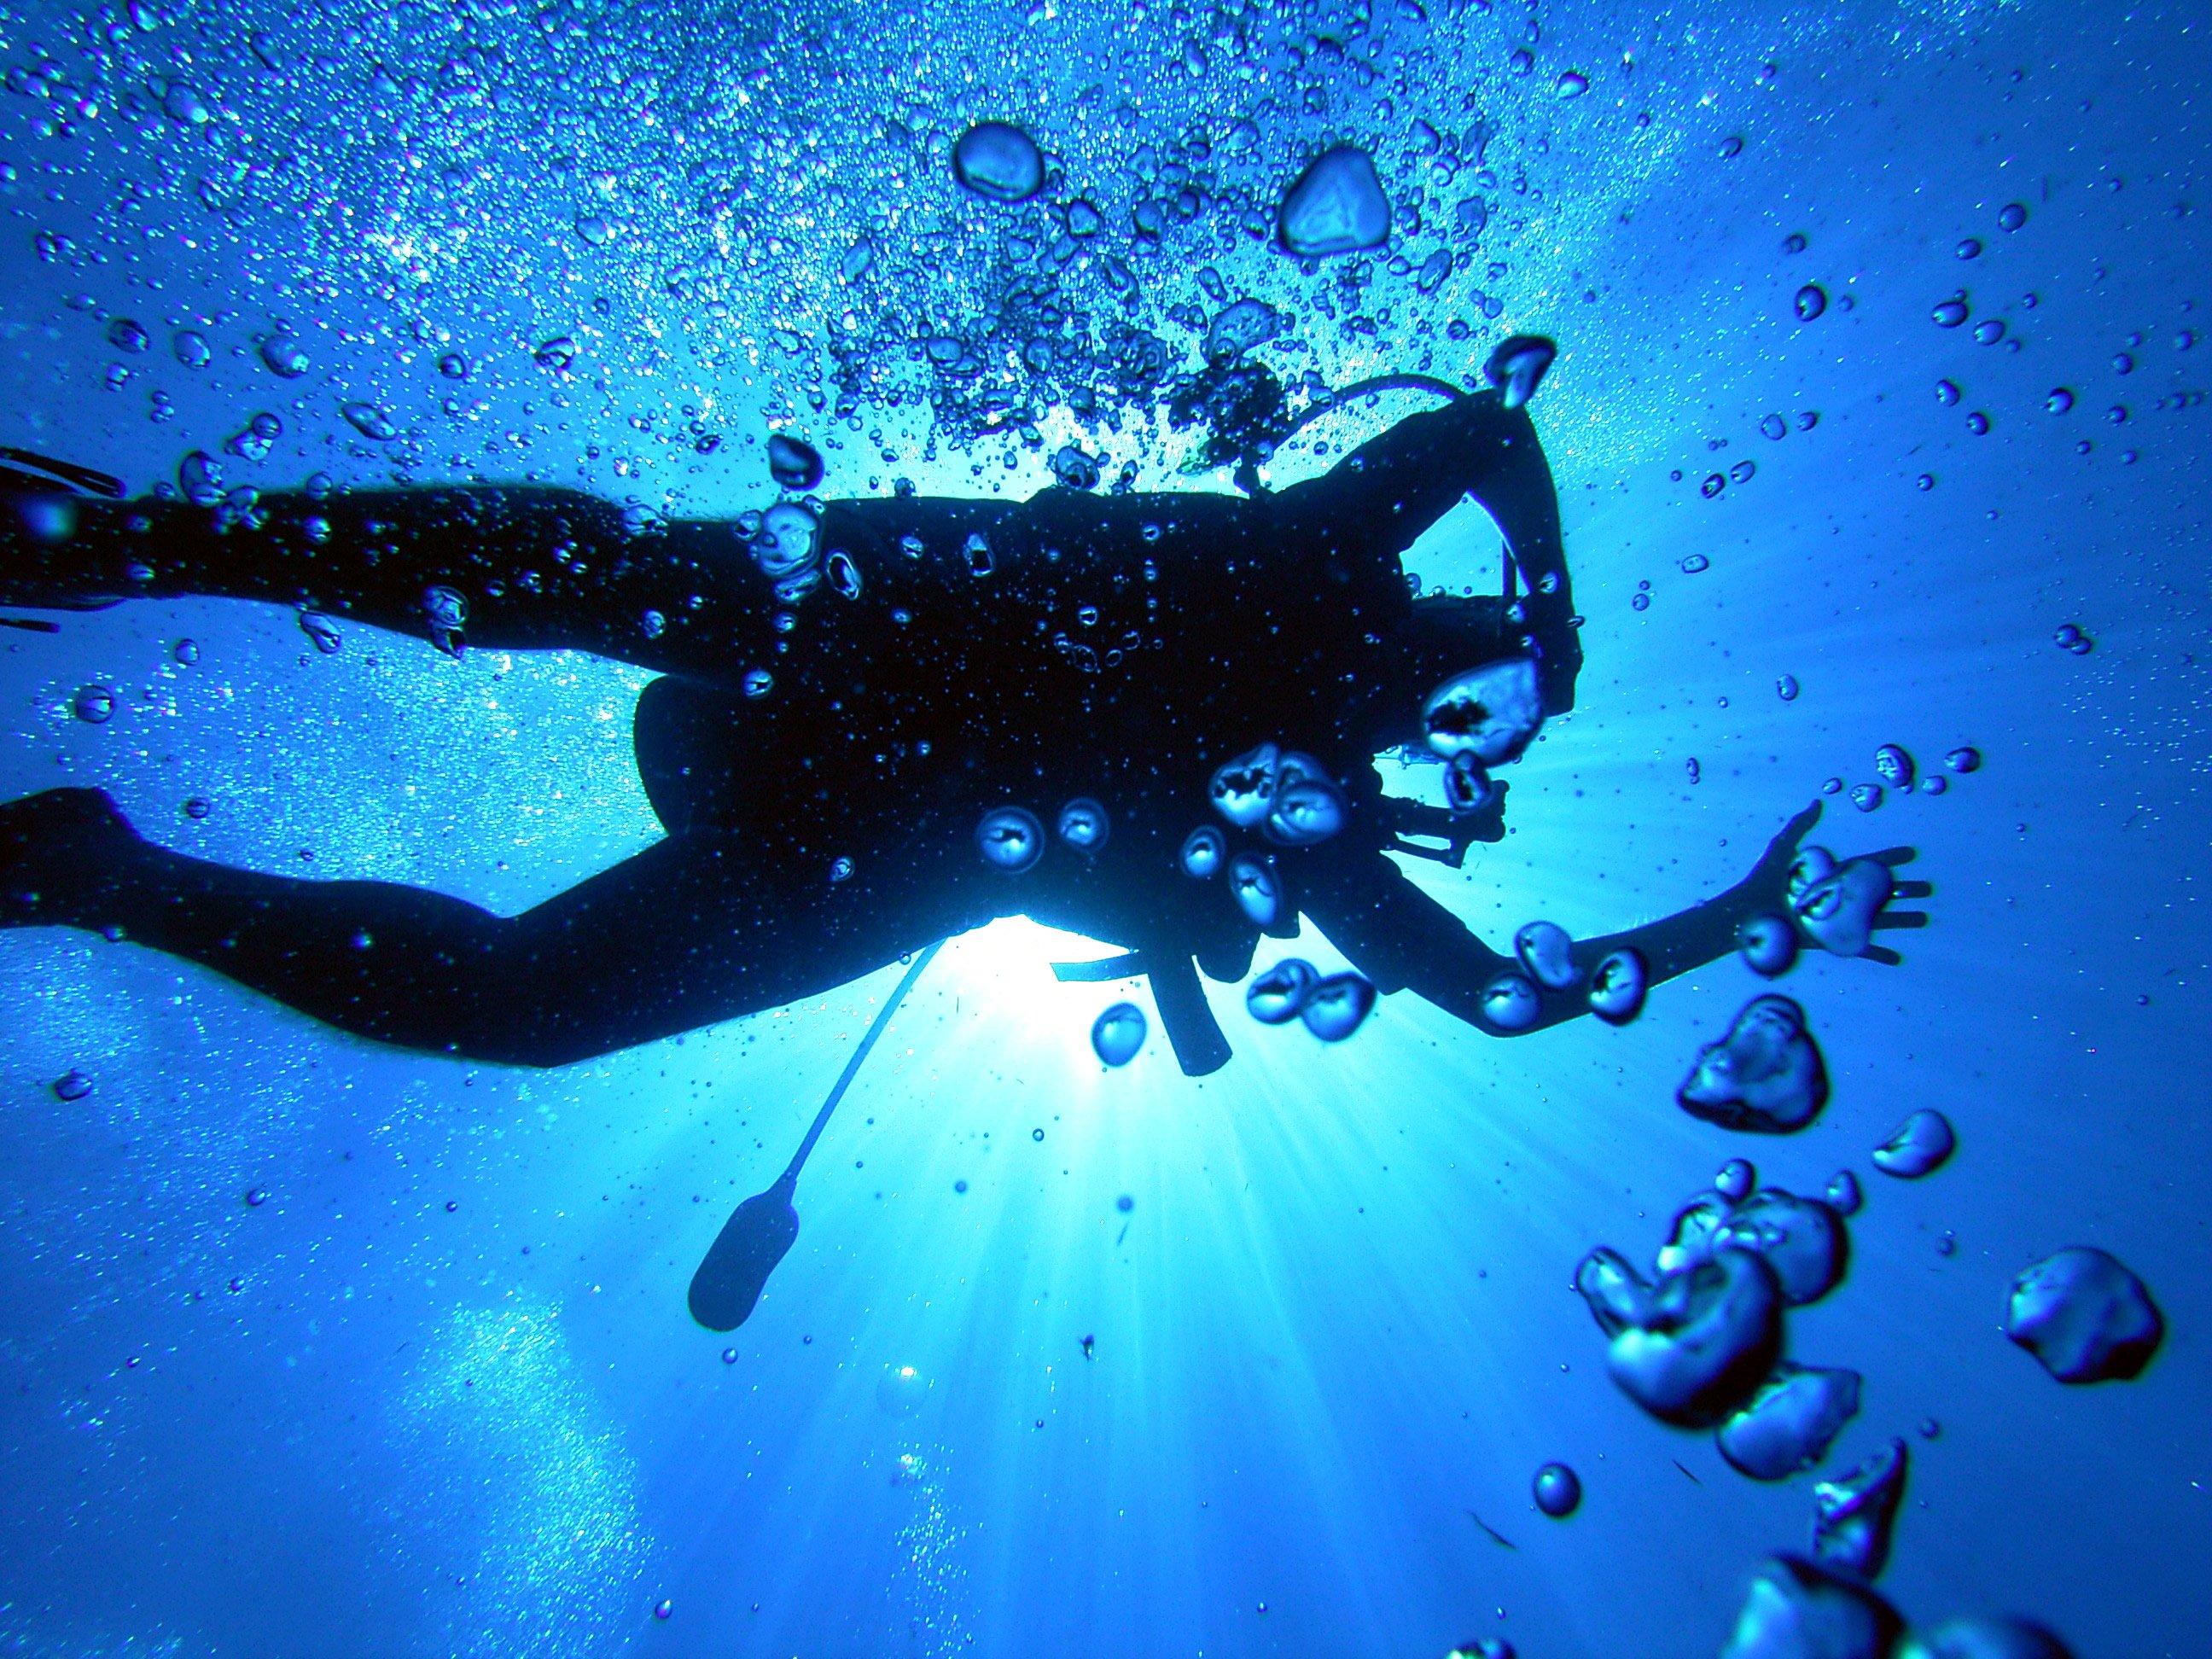 scuba diving wallpaper wallpapers - photo #43